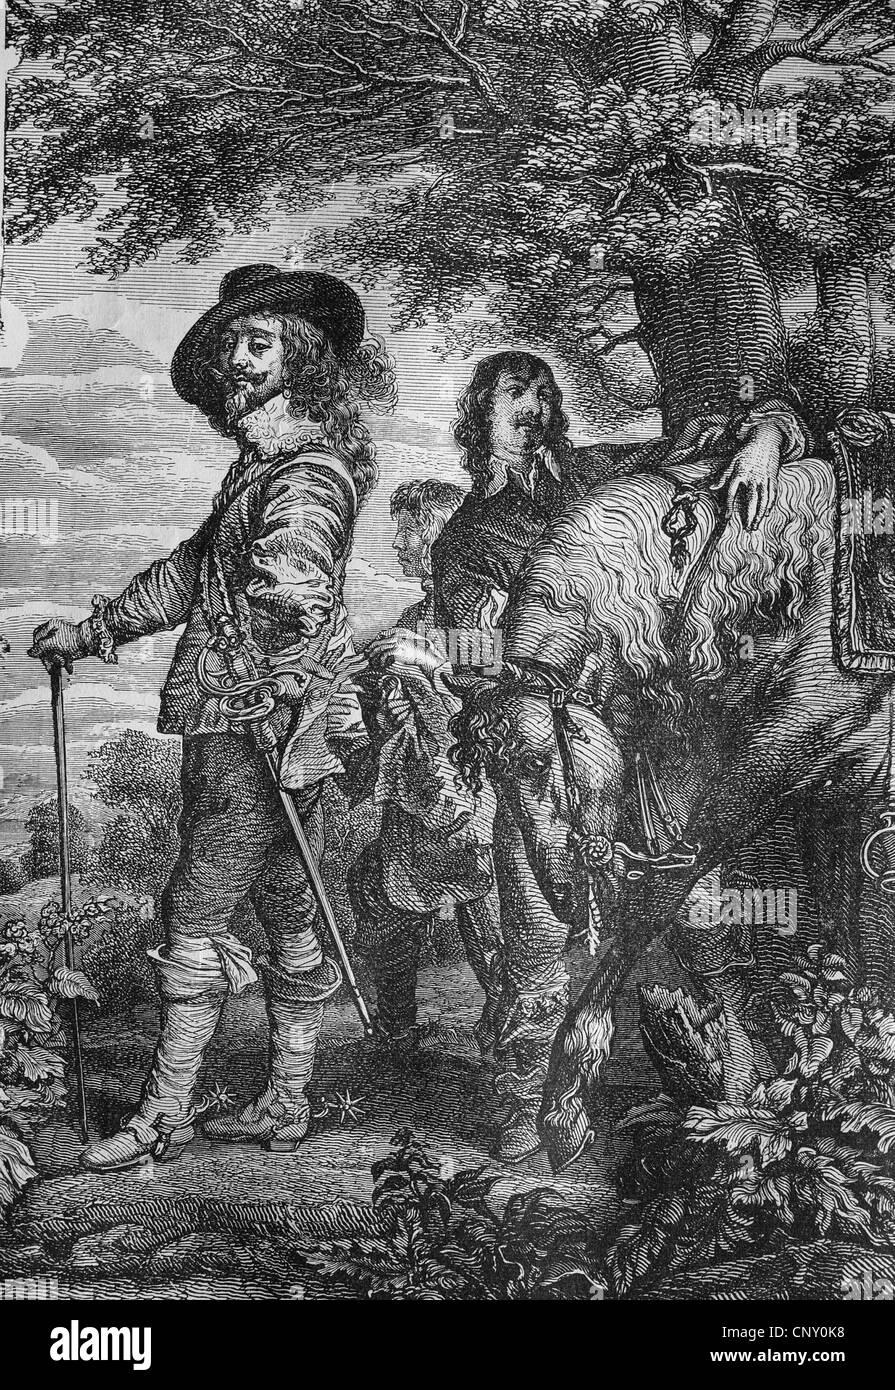 Charles I, 1600 - 1649, King of England, historical woodcut, circa 1888 - Stock Image